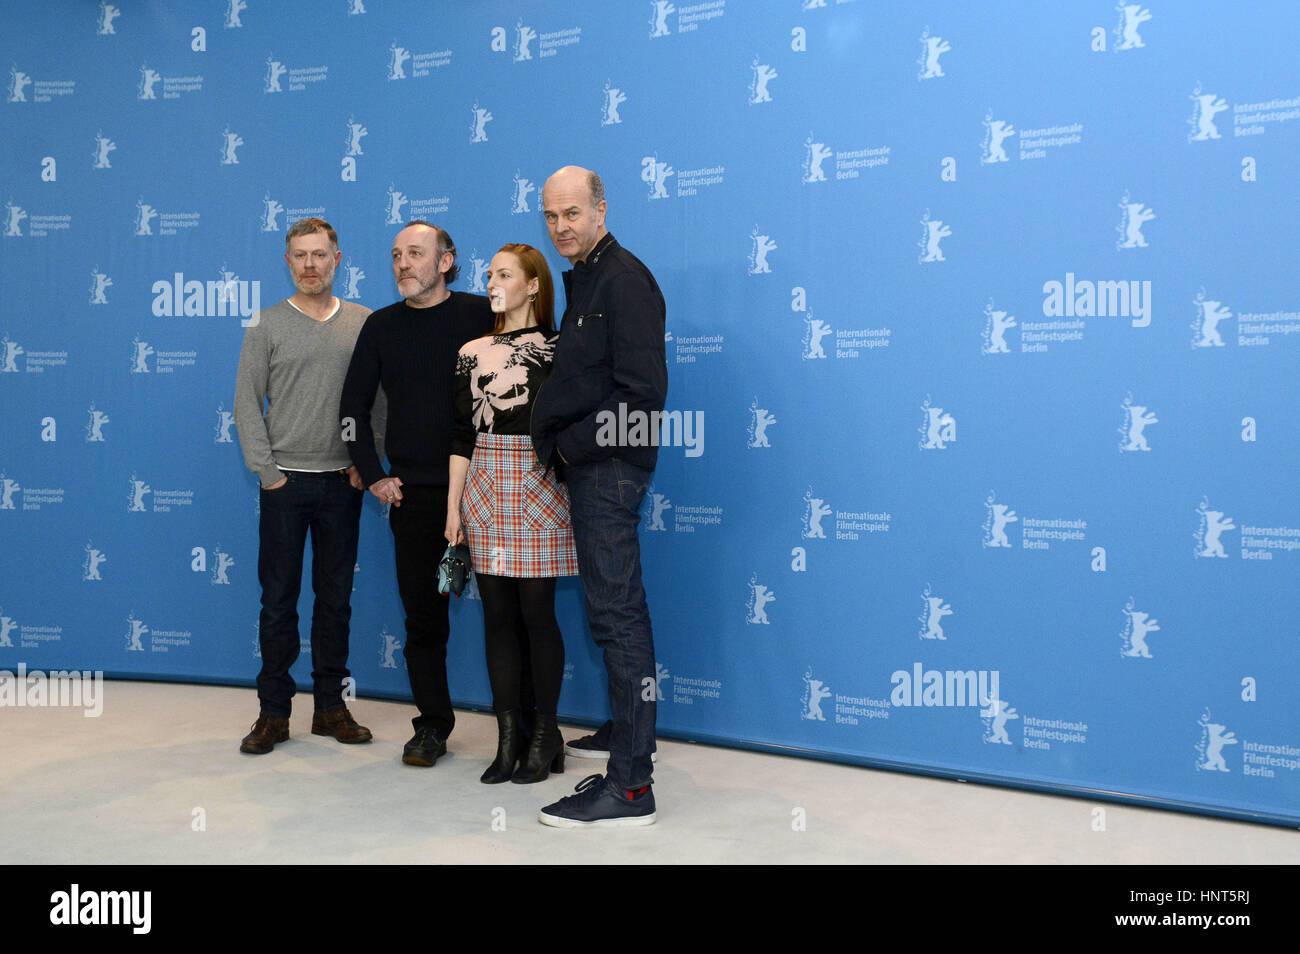 Berlin, Germany. 16th Feb, 2017. Andreas Lust, Karl Markovics, Katharina Schüttler and Erik Poppe during the - Stock Image